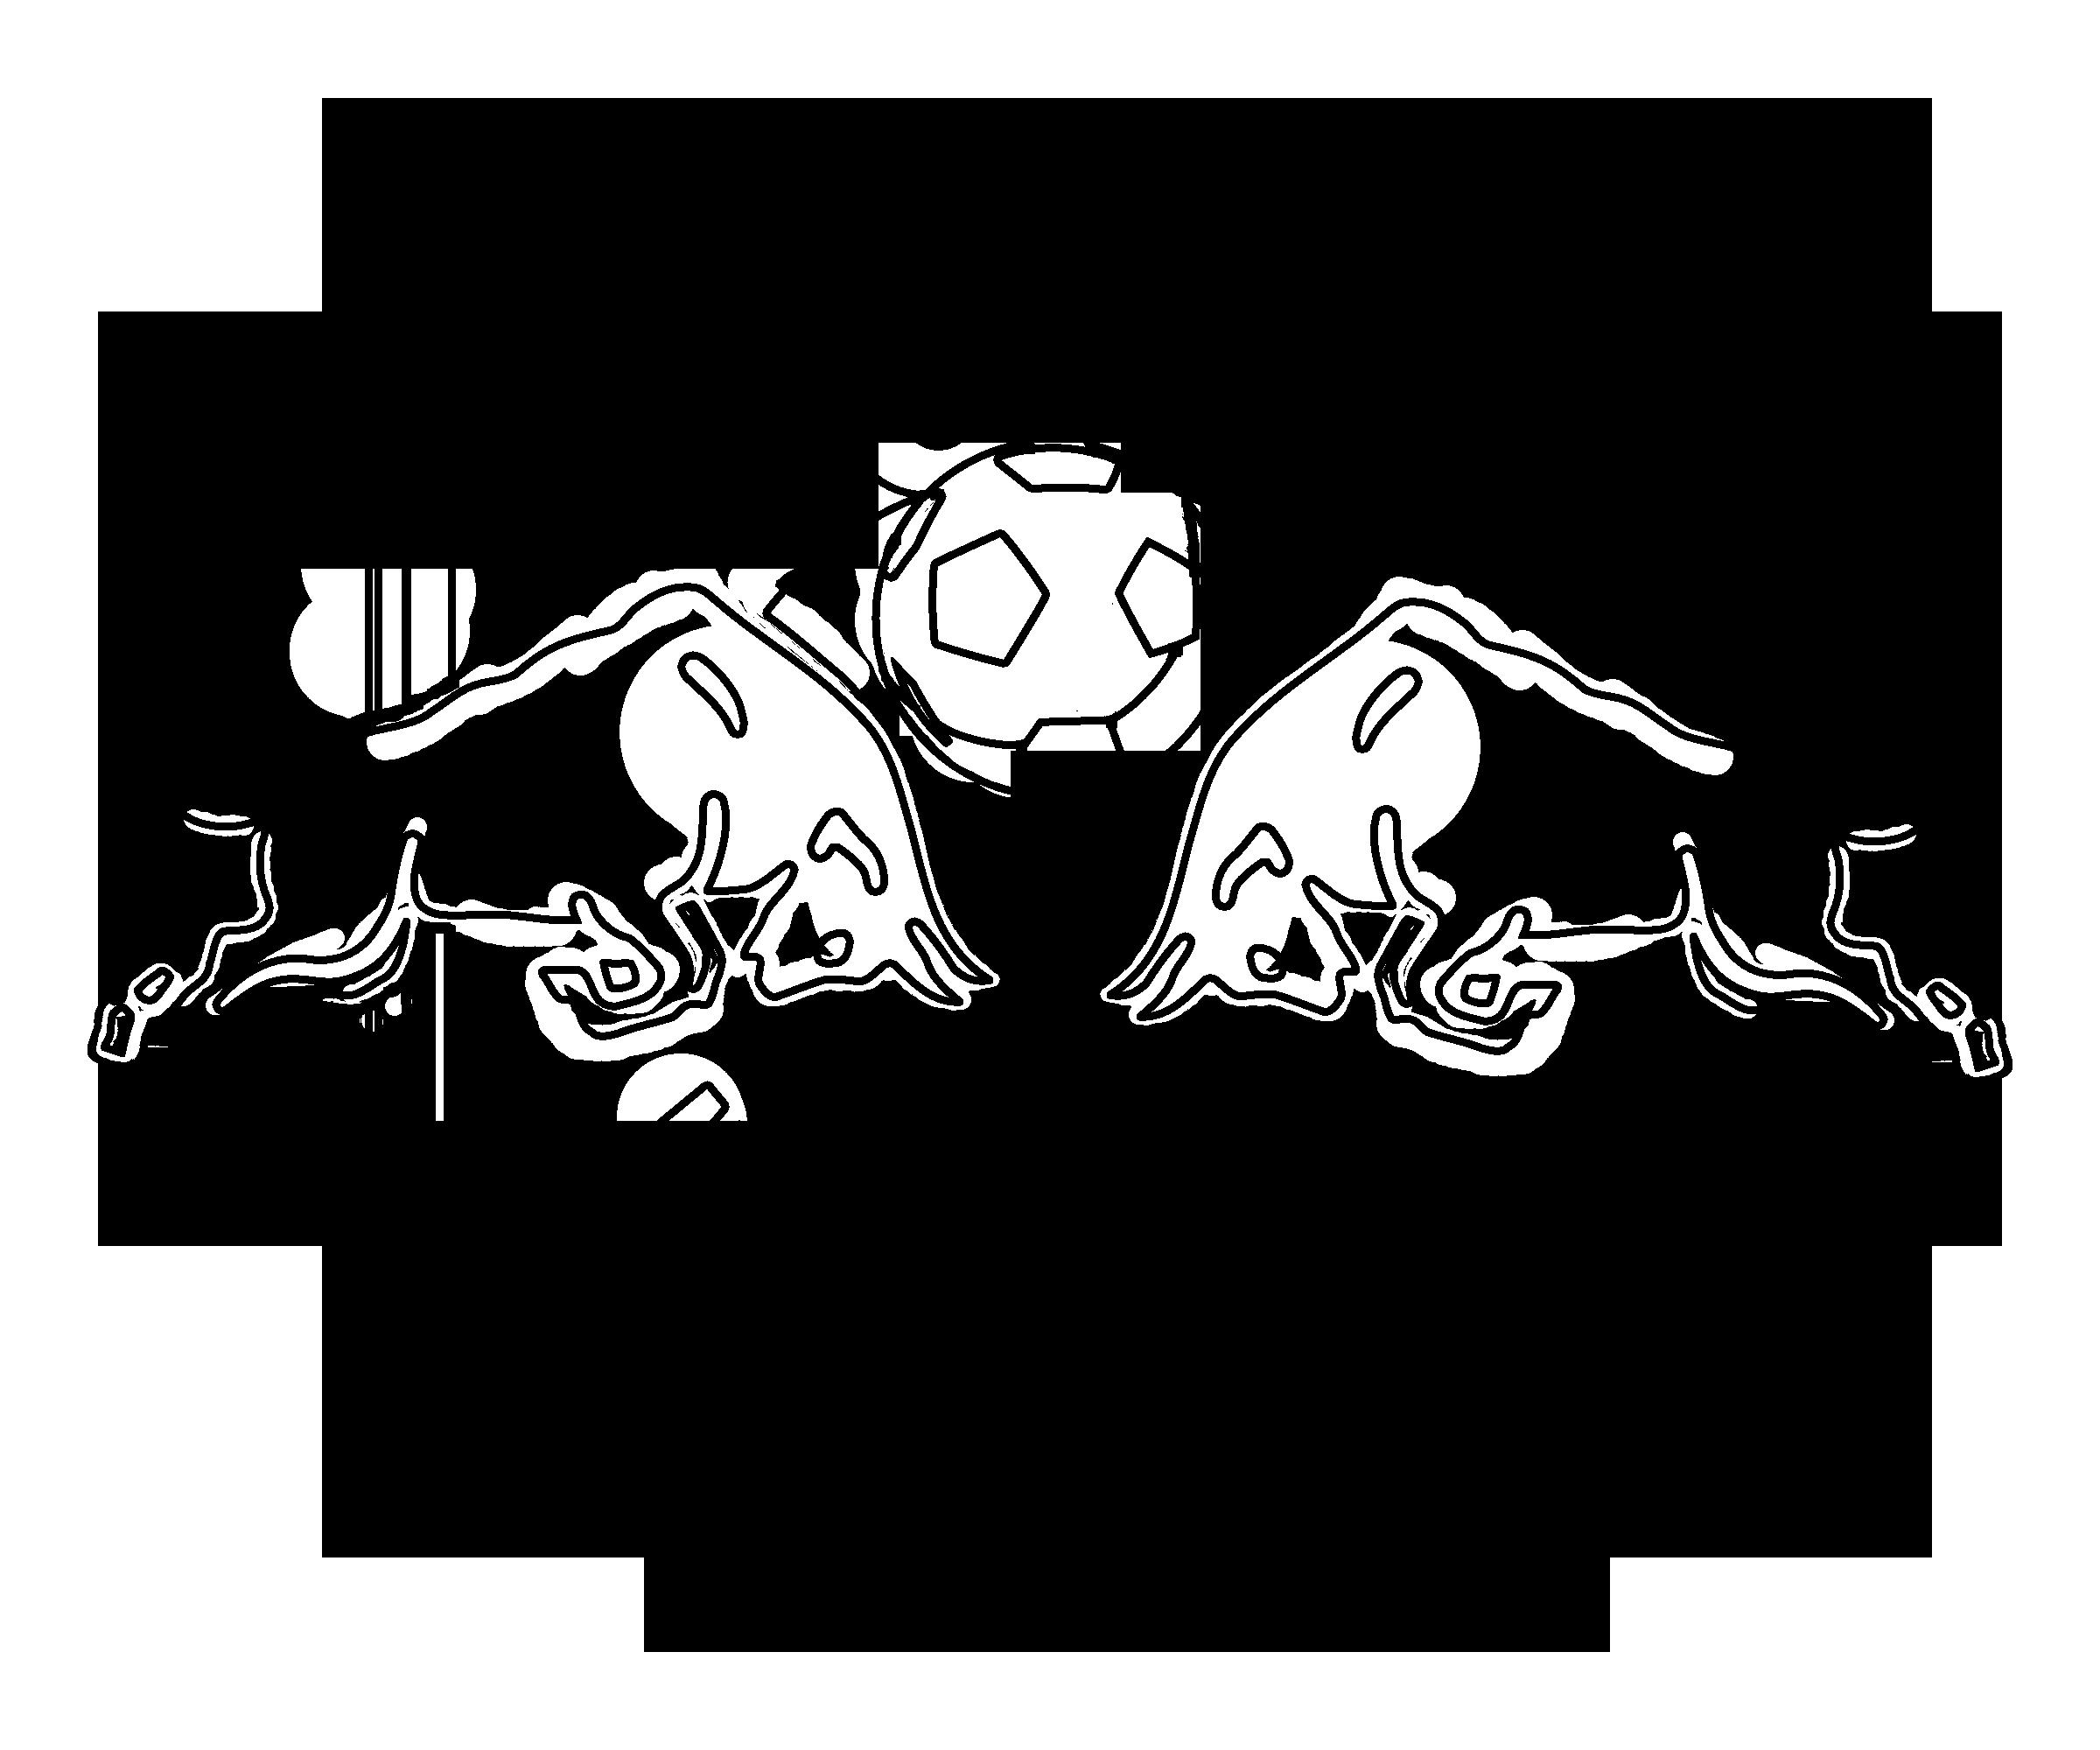 2400x2000 New York Red Bulls Logo Png Transparent Amp Svg Vector